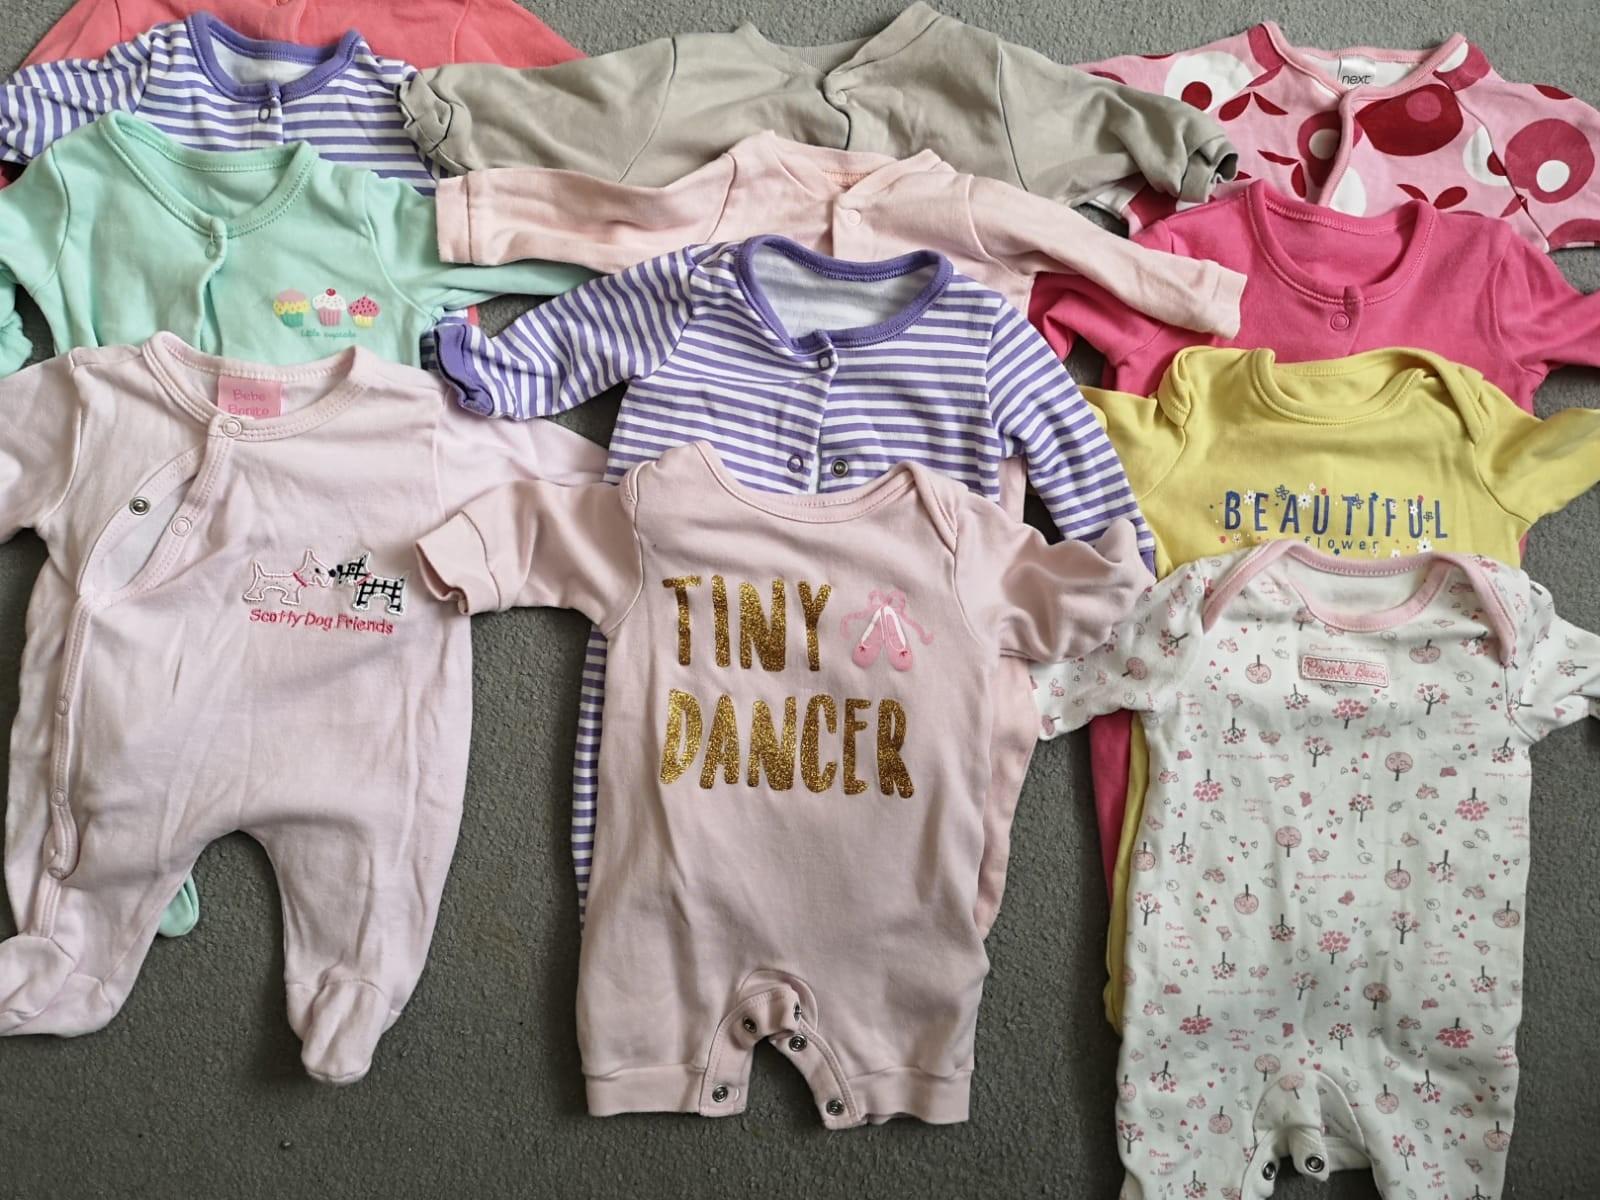 Baby Girls Newborn Sleepsuits X 3 Vgc Be Novel In Design Baby & Toddler Clothing